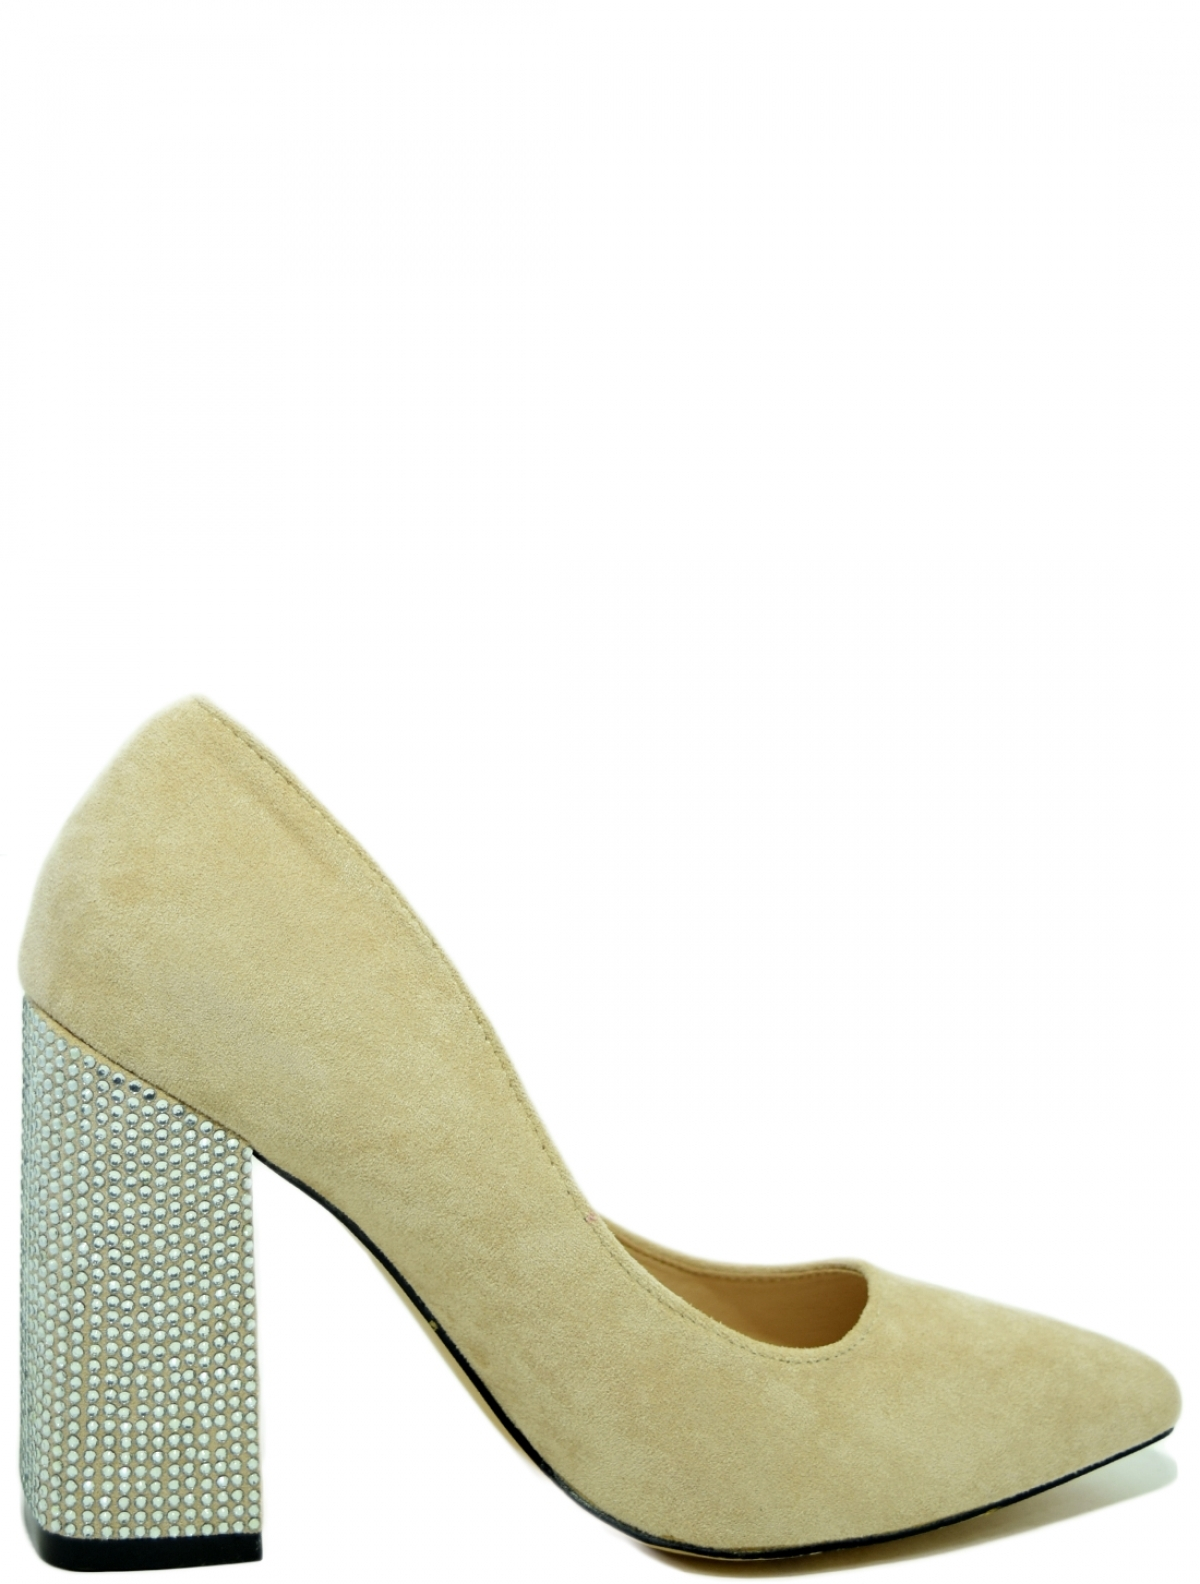 Admlis M557-13 женские туфли